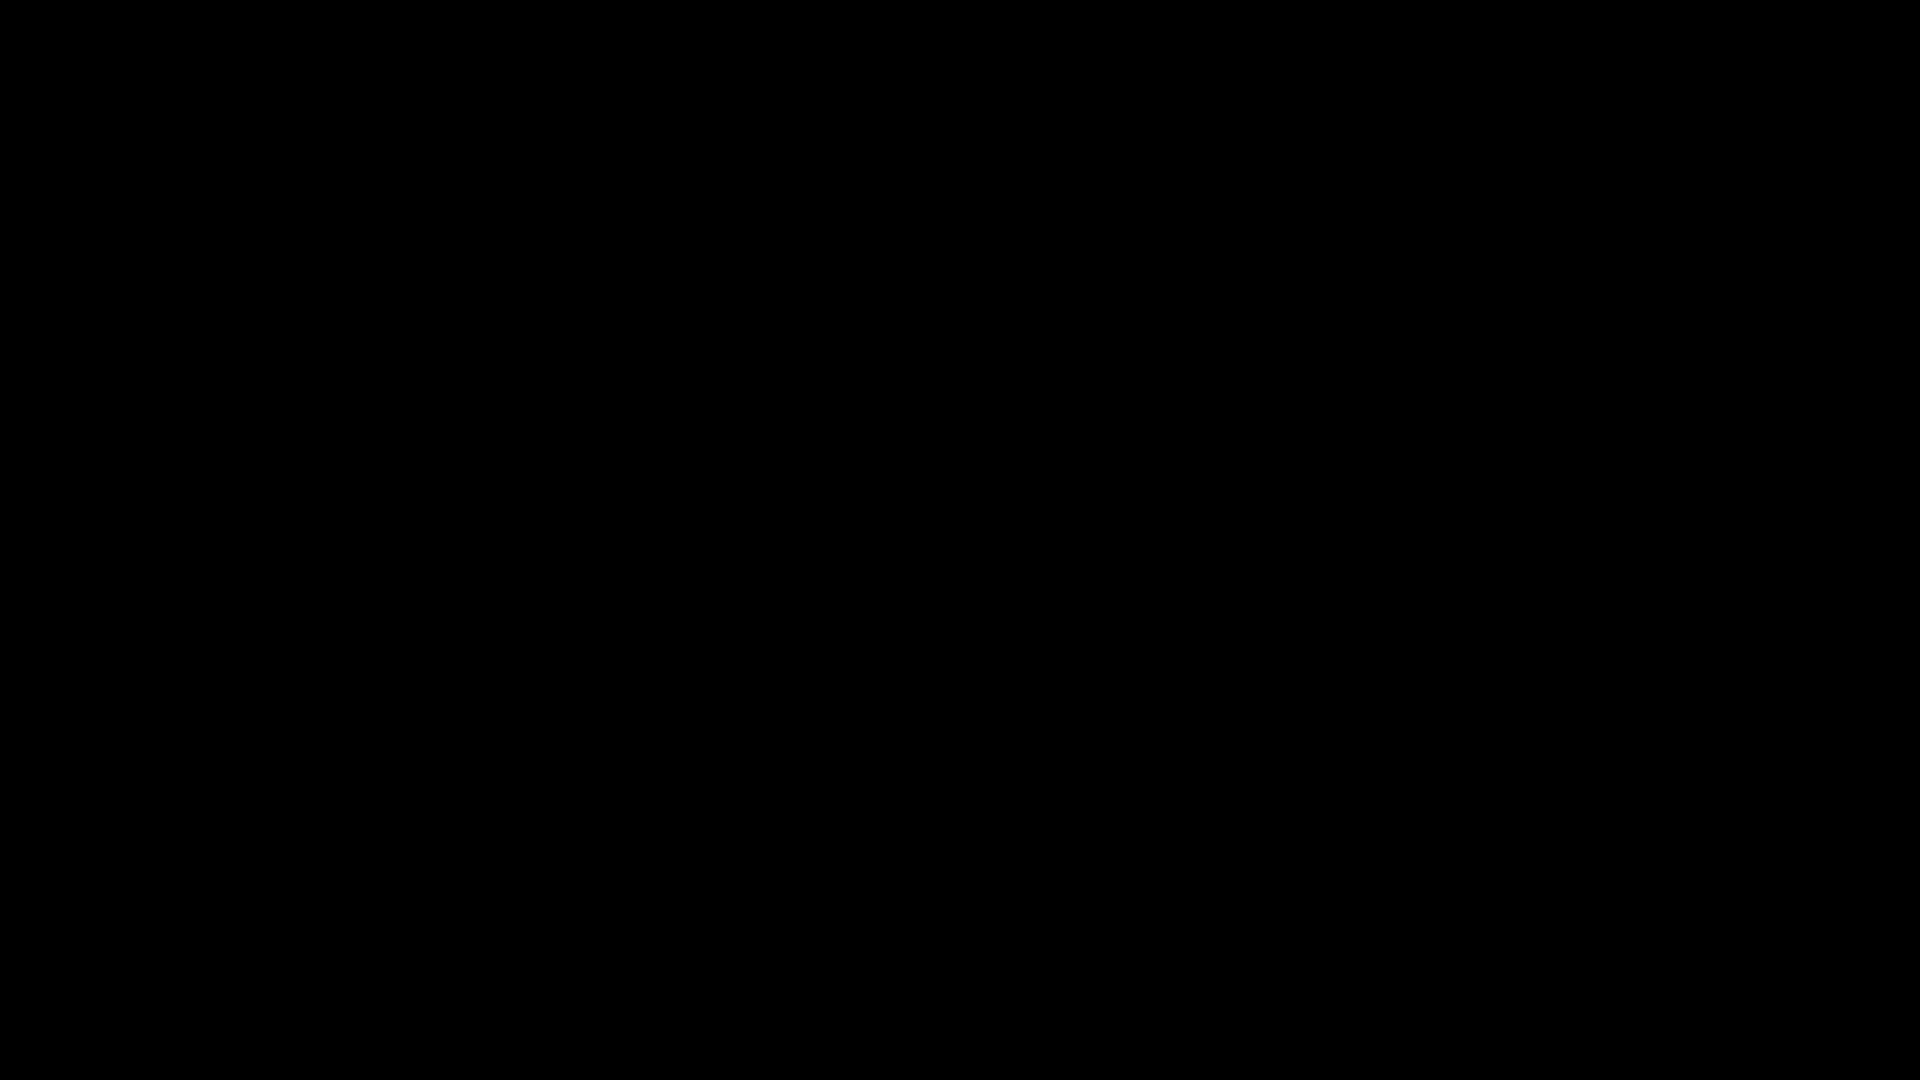 高画質露天女風呂観察 vol.032 露天 盗み撮り動画 103pic 12